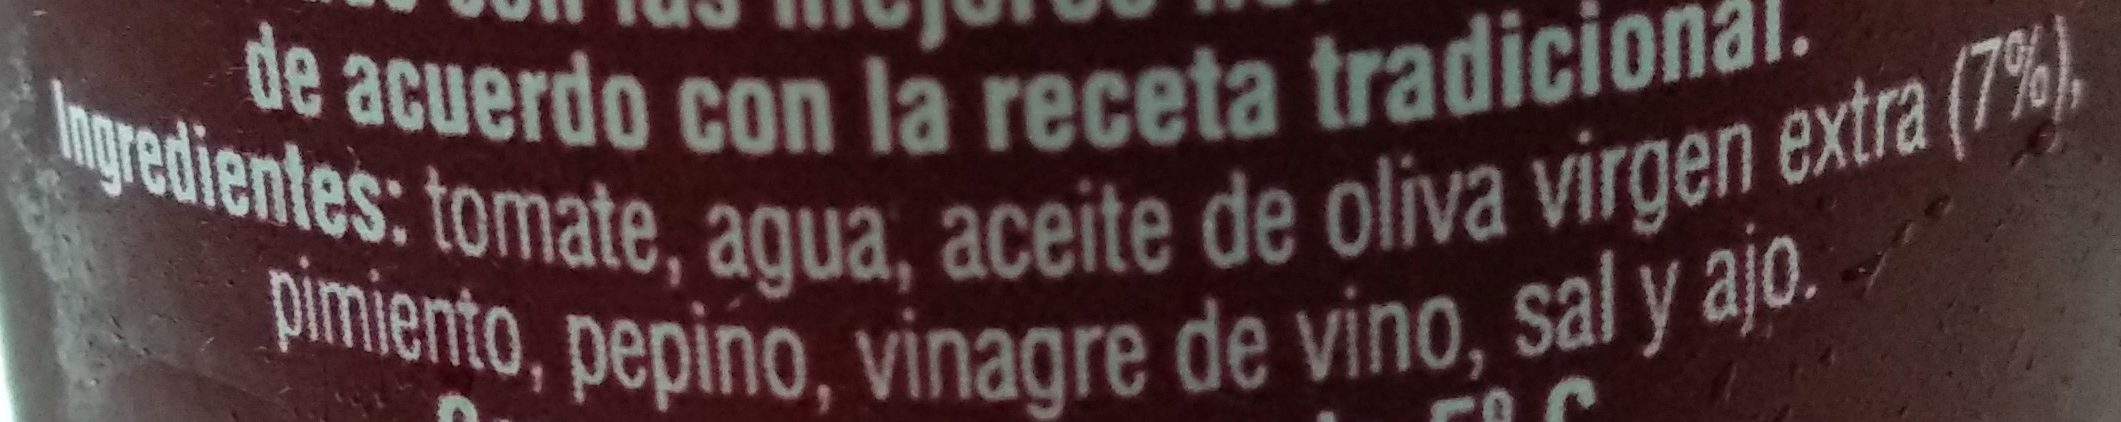 Gazpacho fresco con aceite de oliva virgen extra - Ingredientes